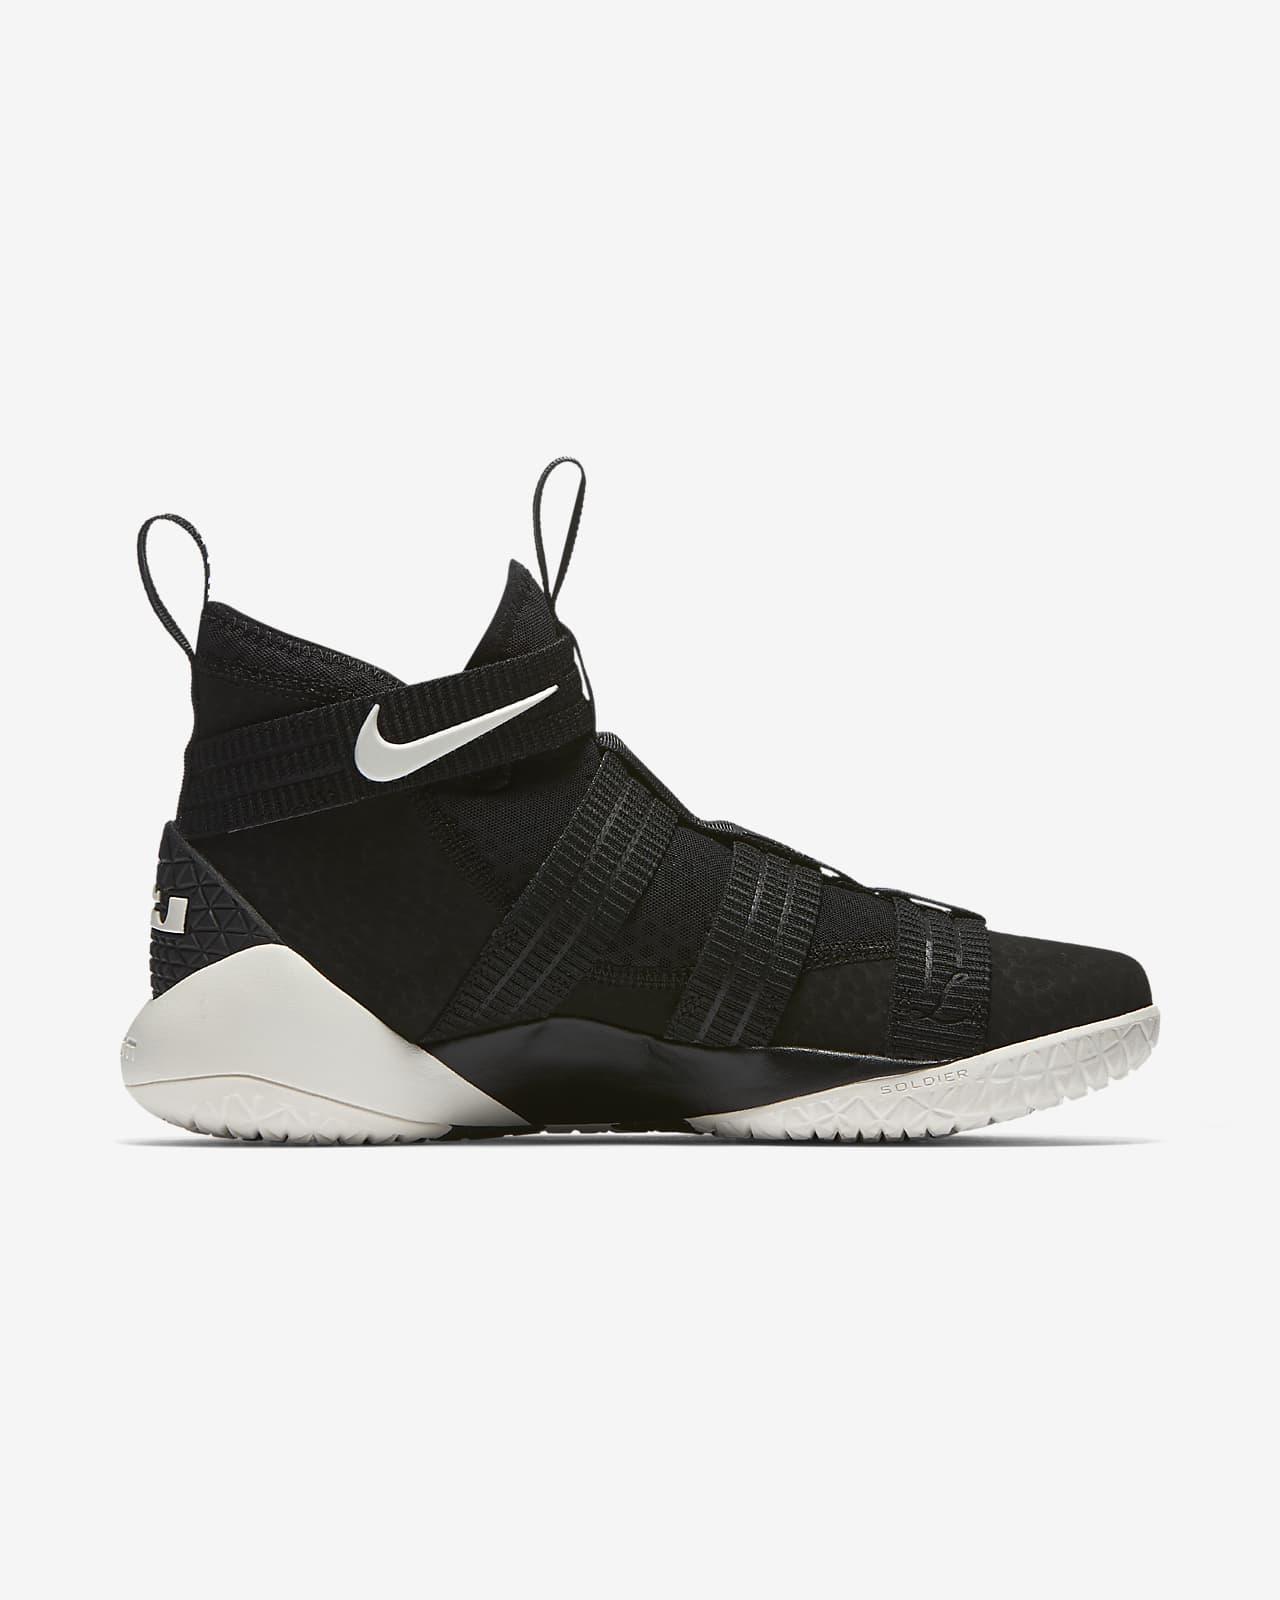 LeBron Soldier XI SFG Basketball Shoe